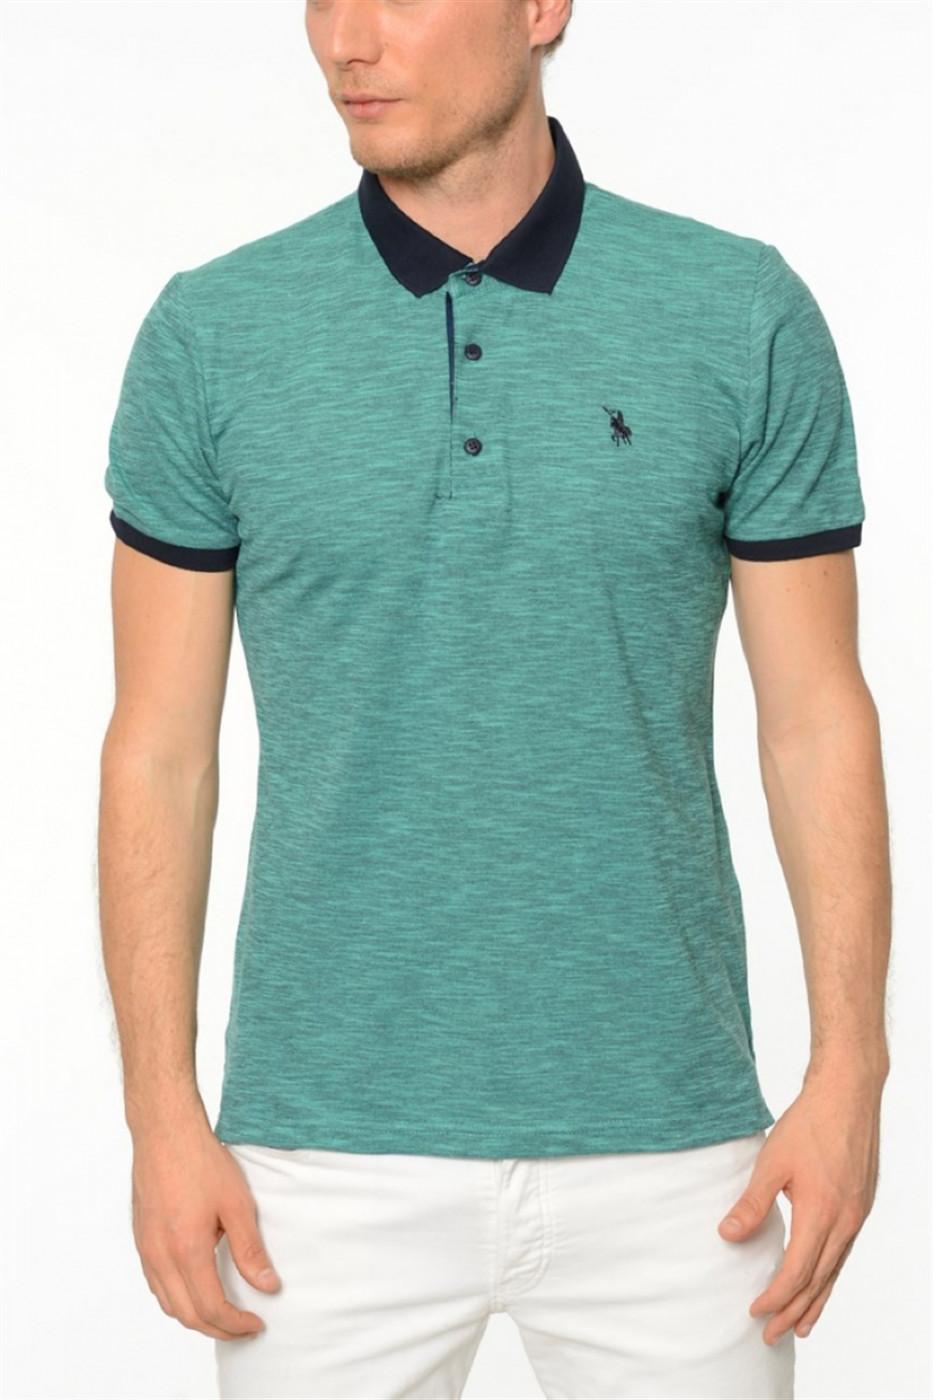 T8534 Dewberry T-shirt-mint